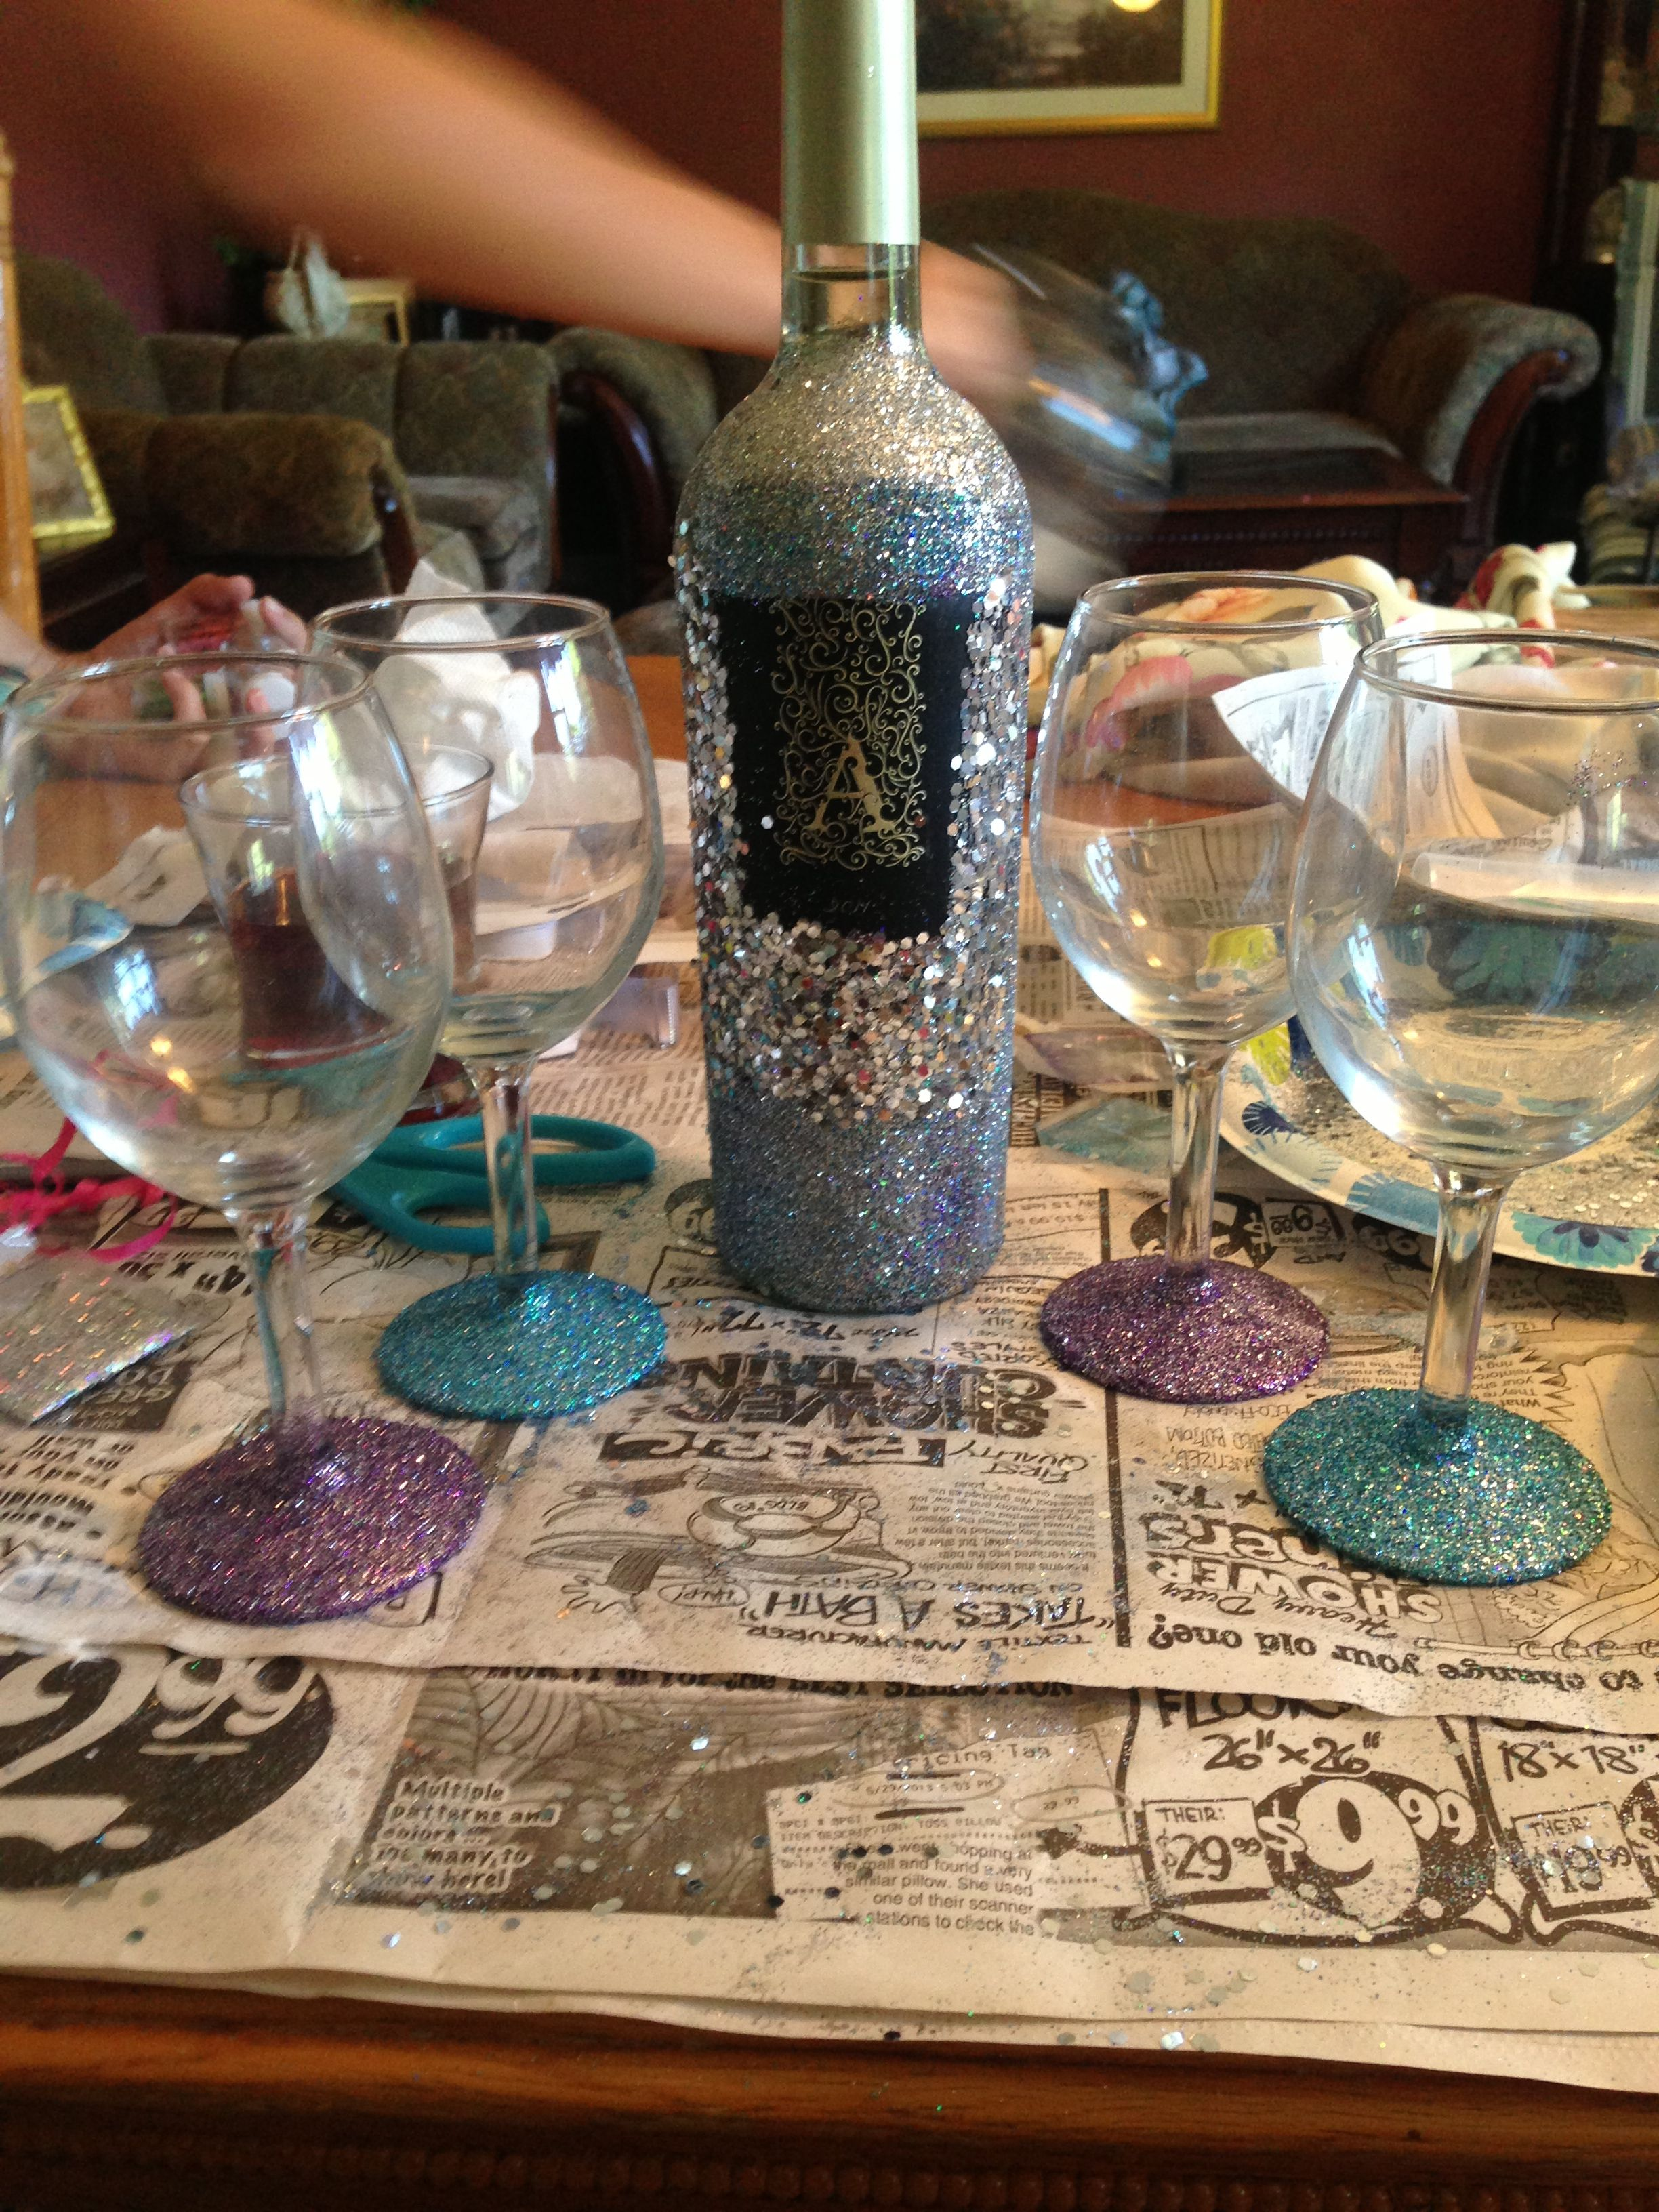 Diy 21st birthday gift glitter wine bottle and glasses for Wine bottle glasses diy